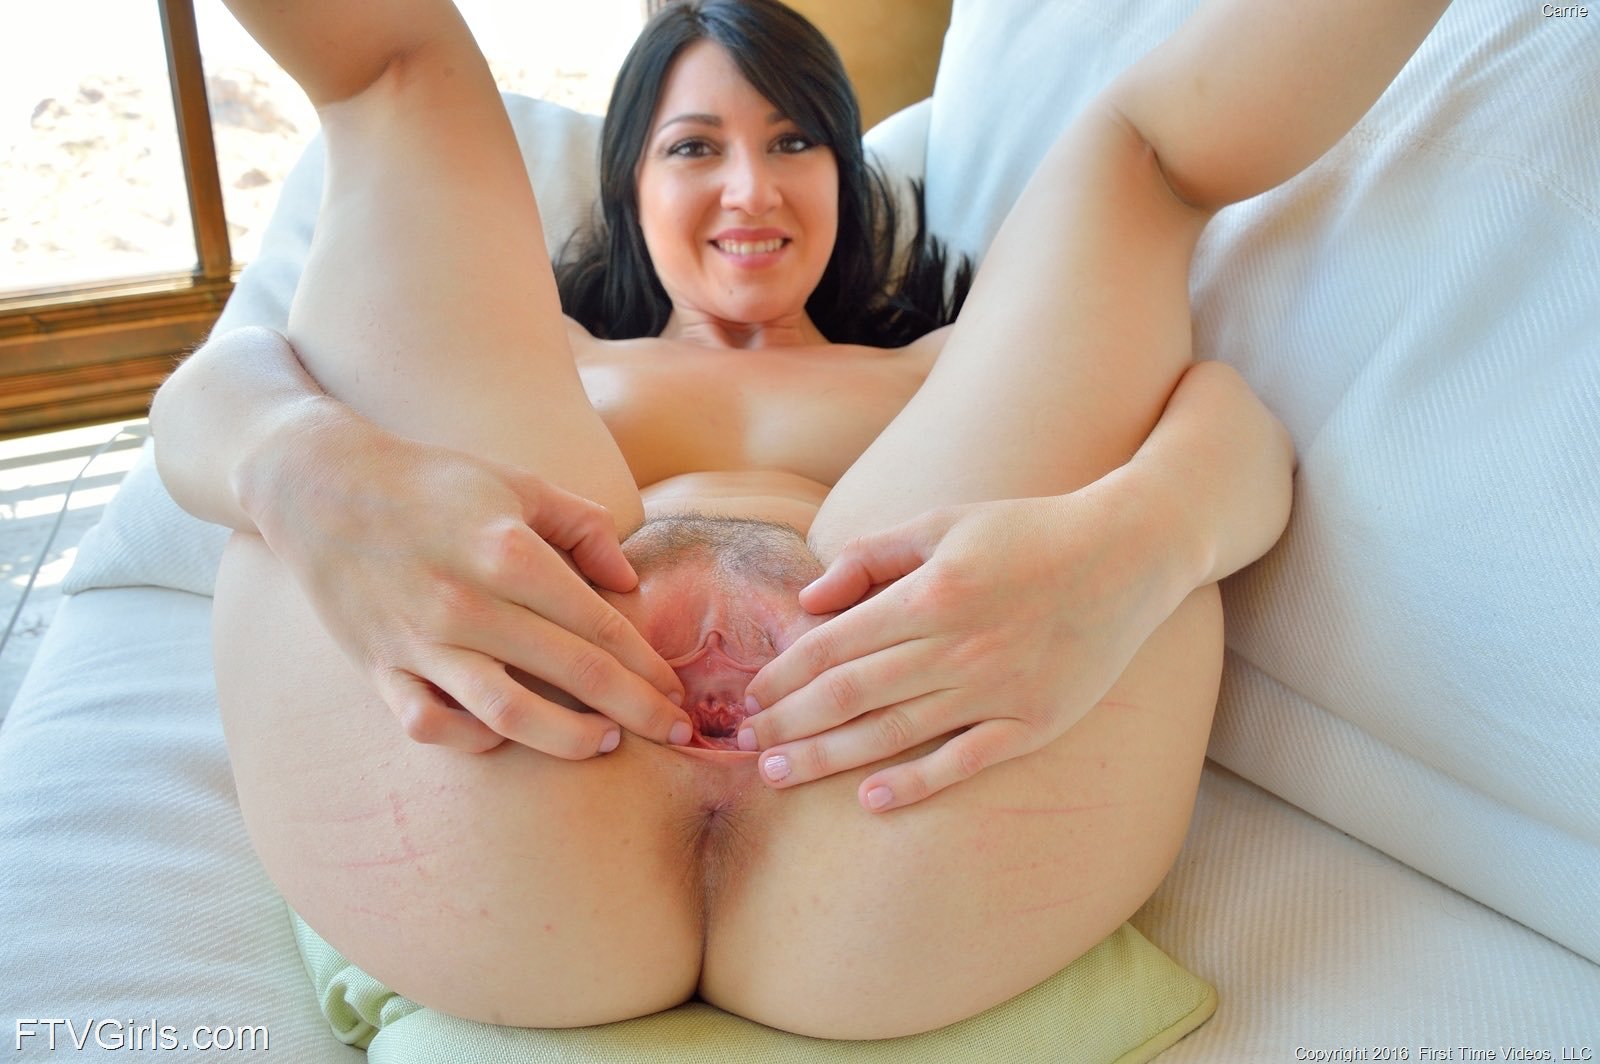 Forum on this topic: Megan davison hot, aubrey-oday-sexy-tits-9-photos/